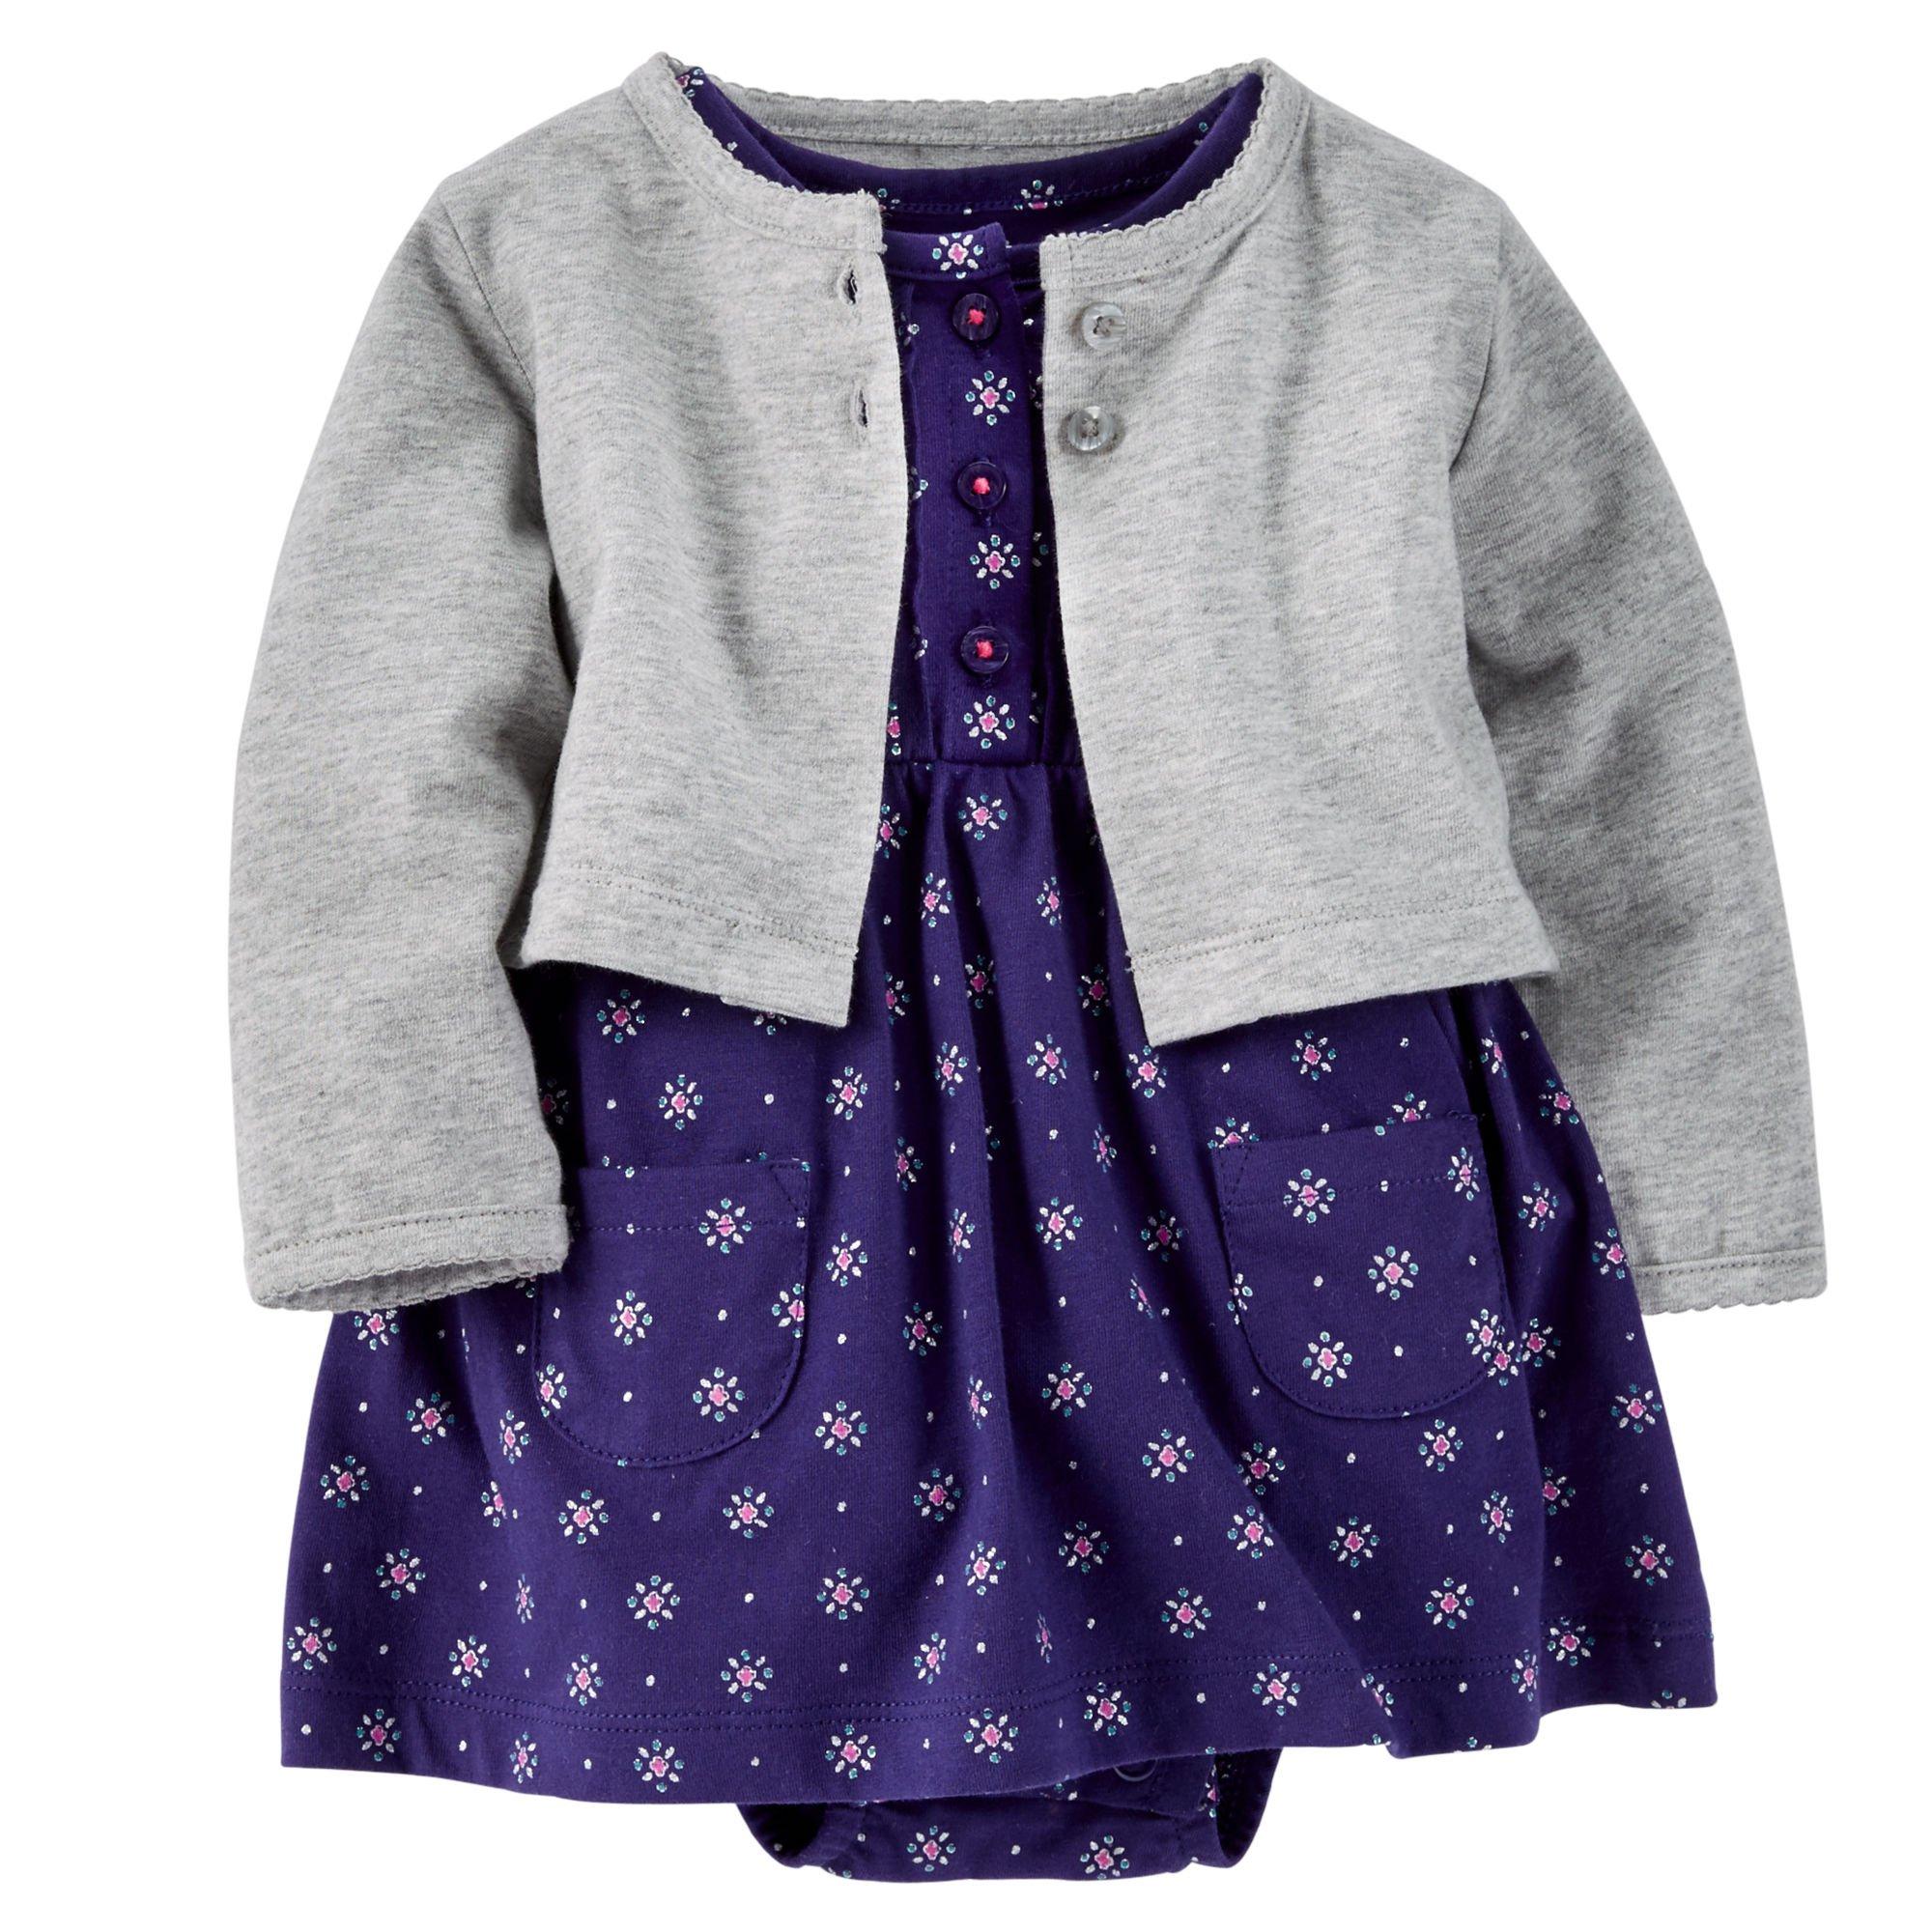 Carter's Baby Girls' 2-Piece Dress and Cardigan Set (6 months, Purple)